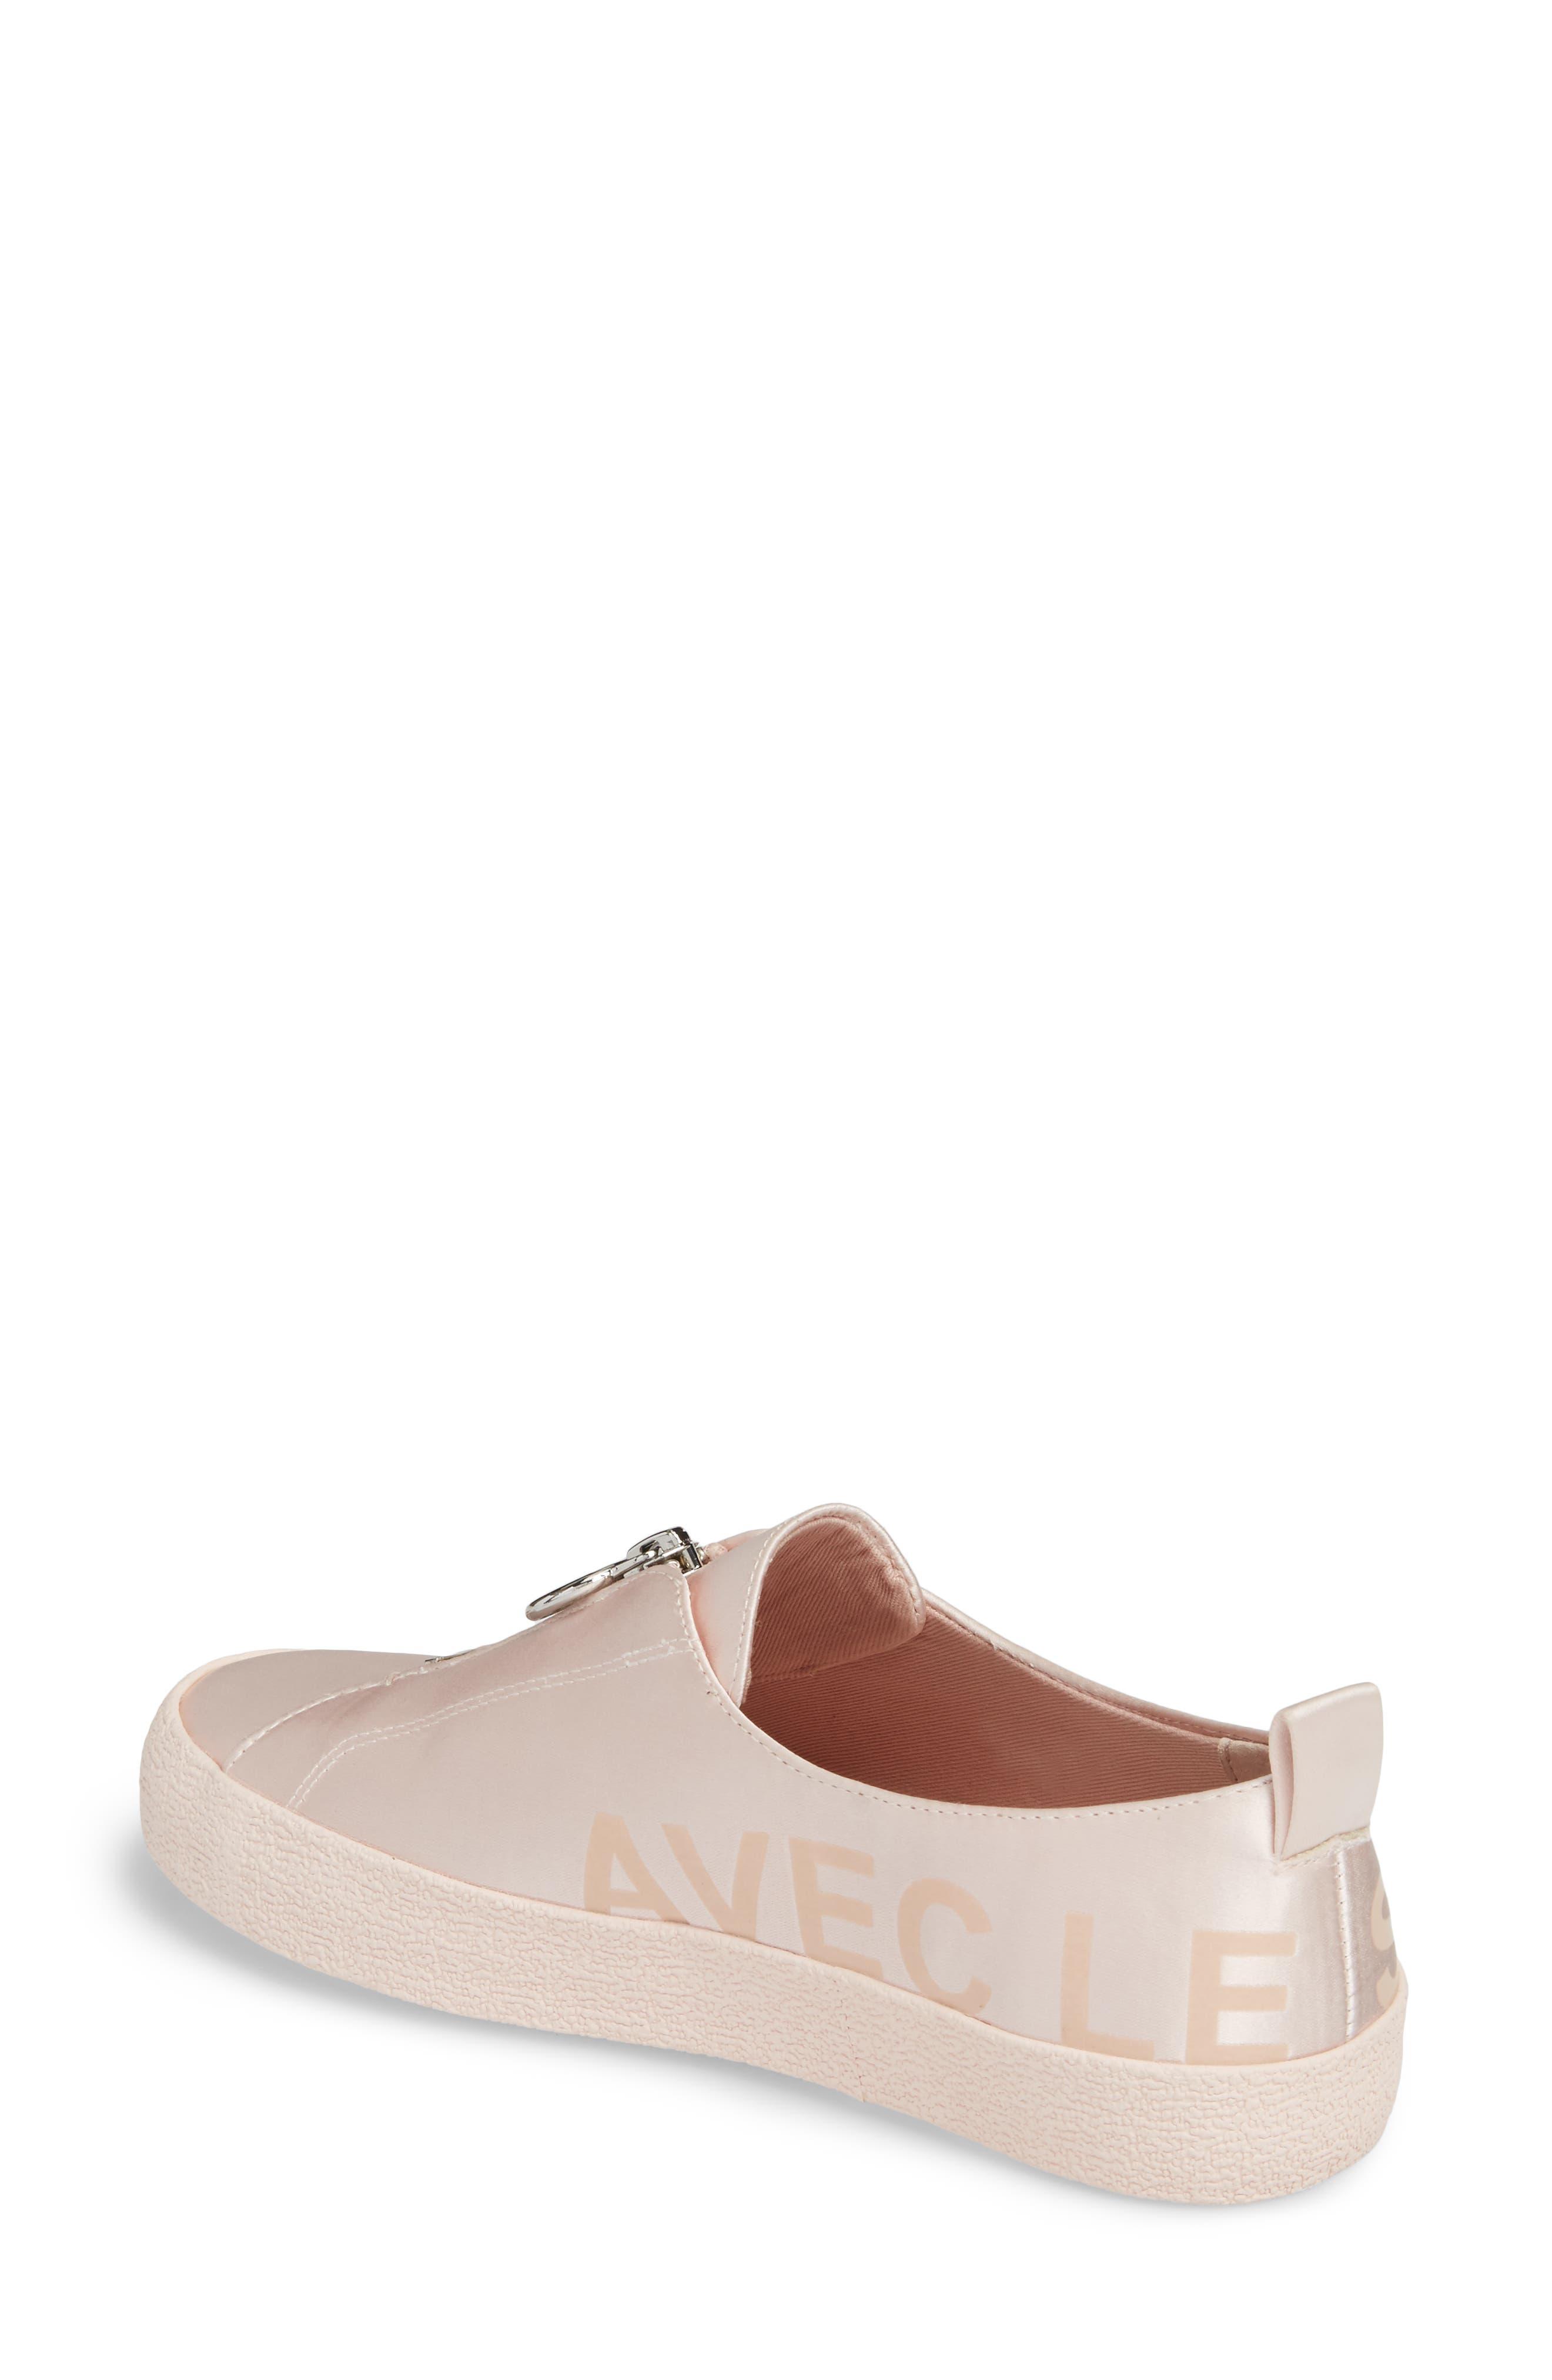 Sasha Zip Sneaker,                             Alternate thumbnail 6, color,